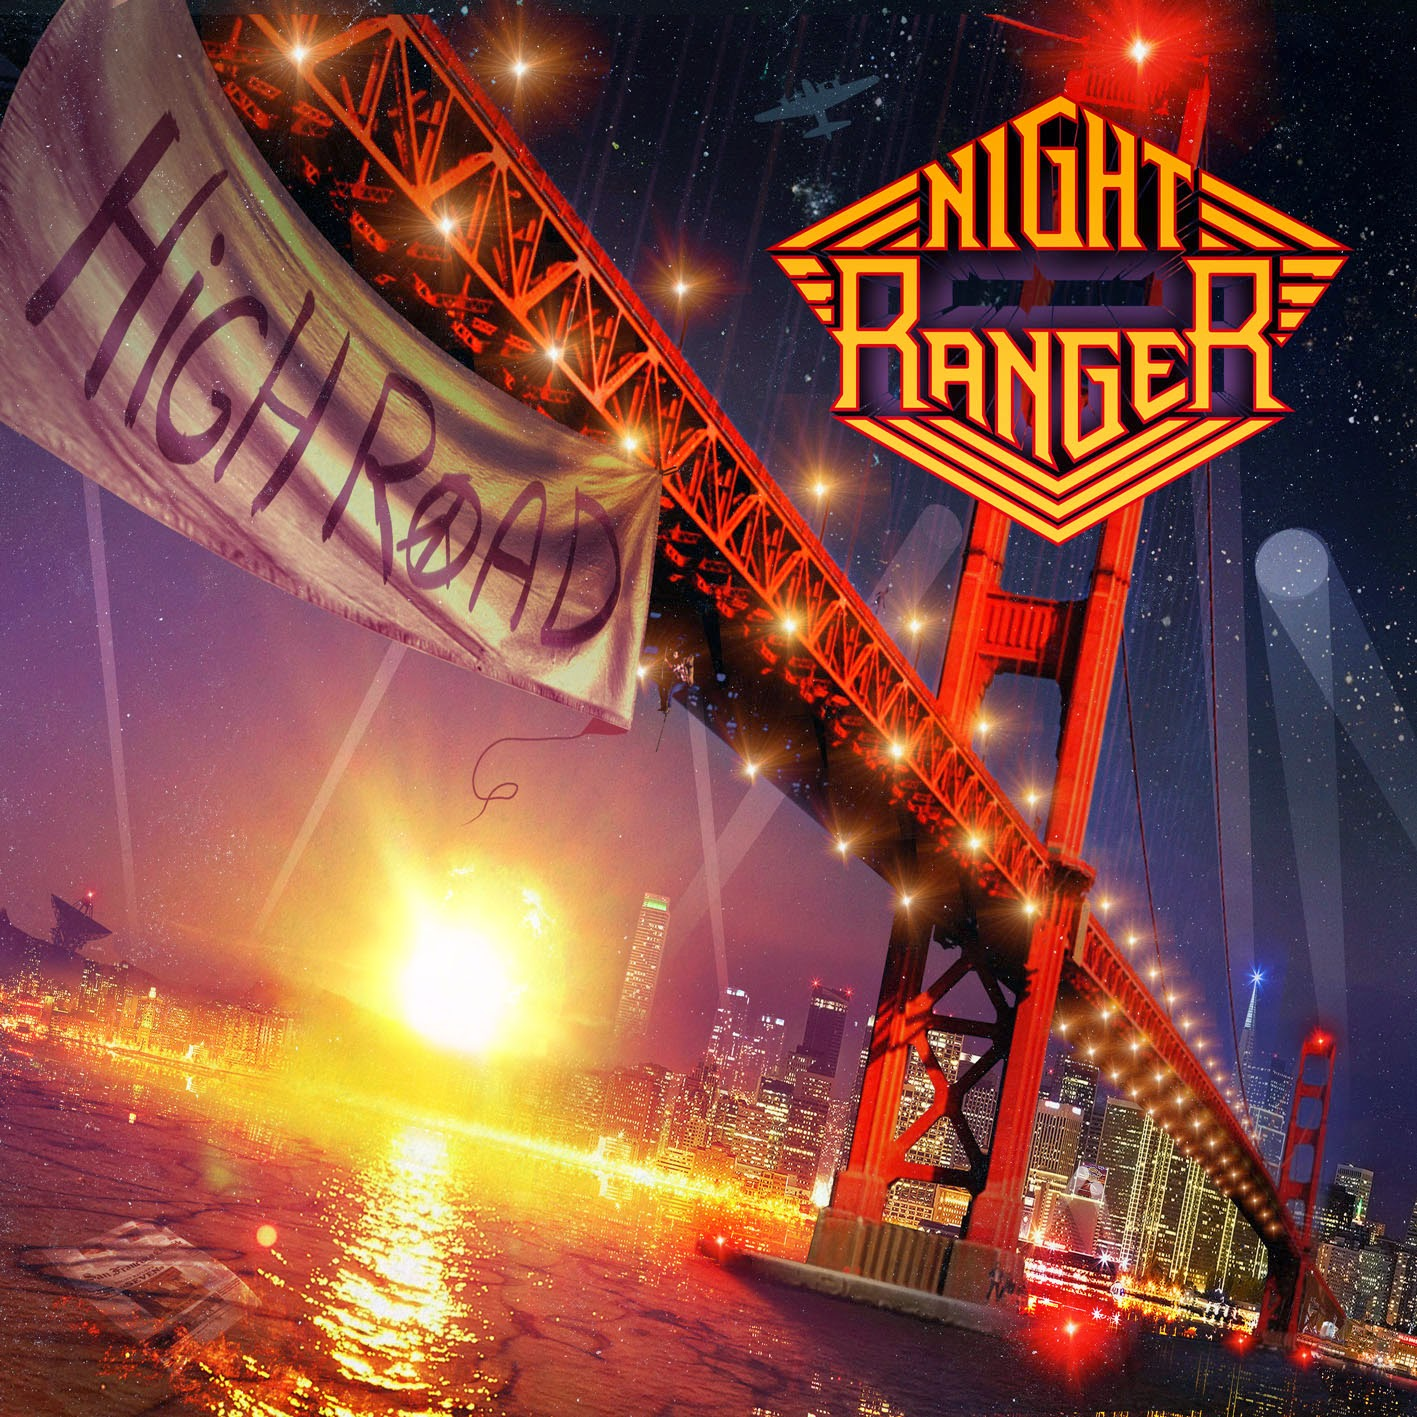 http://rock-and-metal-4-you.blogspot.de/2014/06/cd-review-night-ranger-high-road.html